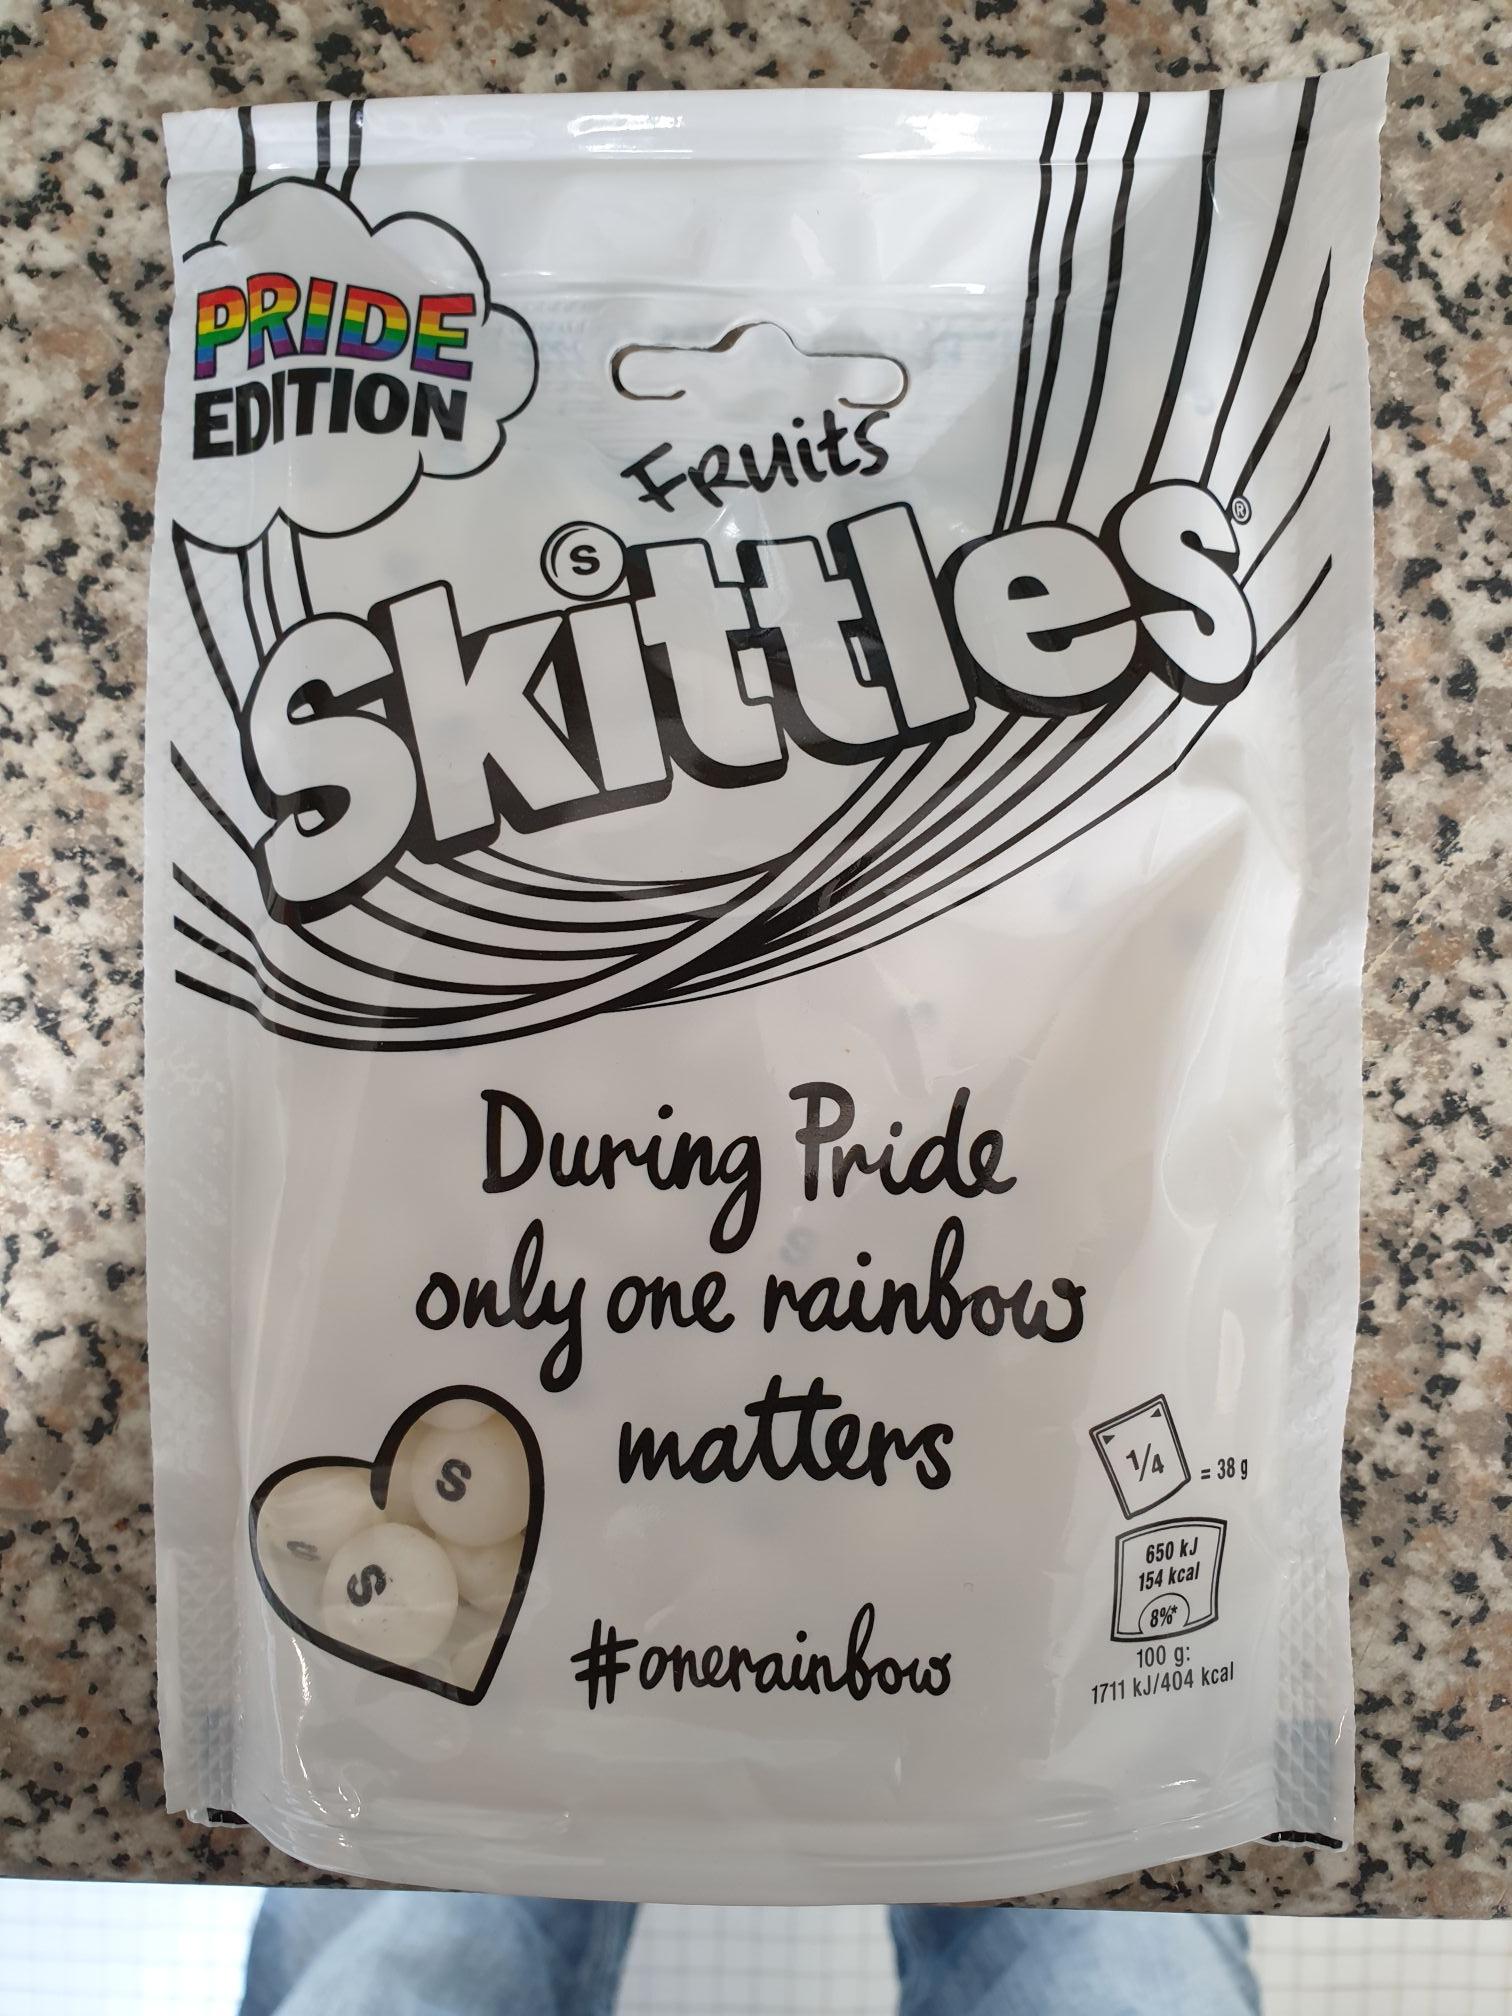 White Skittles PRIDE edition 152g only 49p Farmfoods (Tredegar)